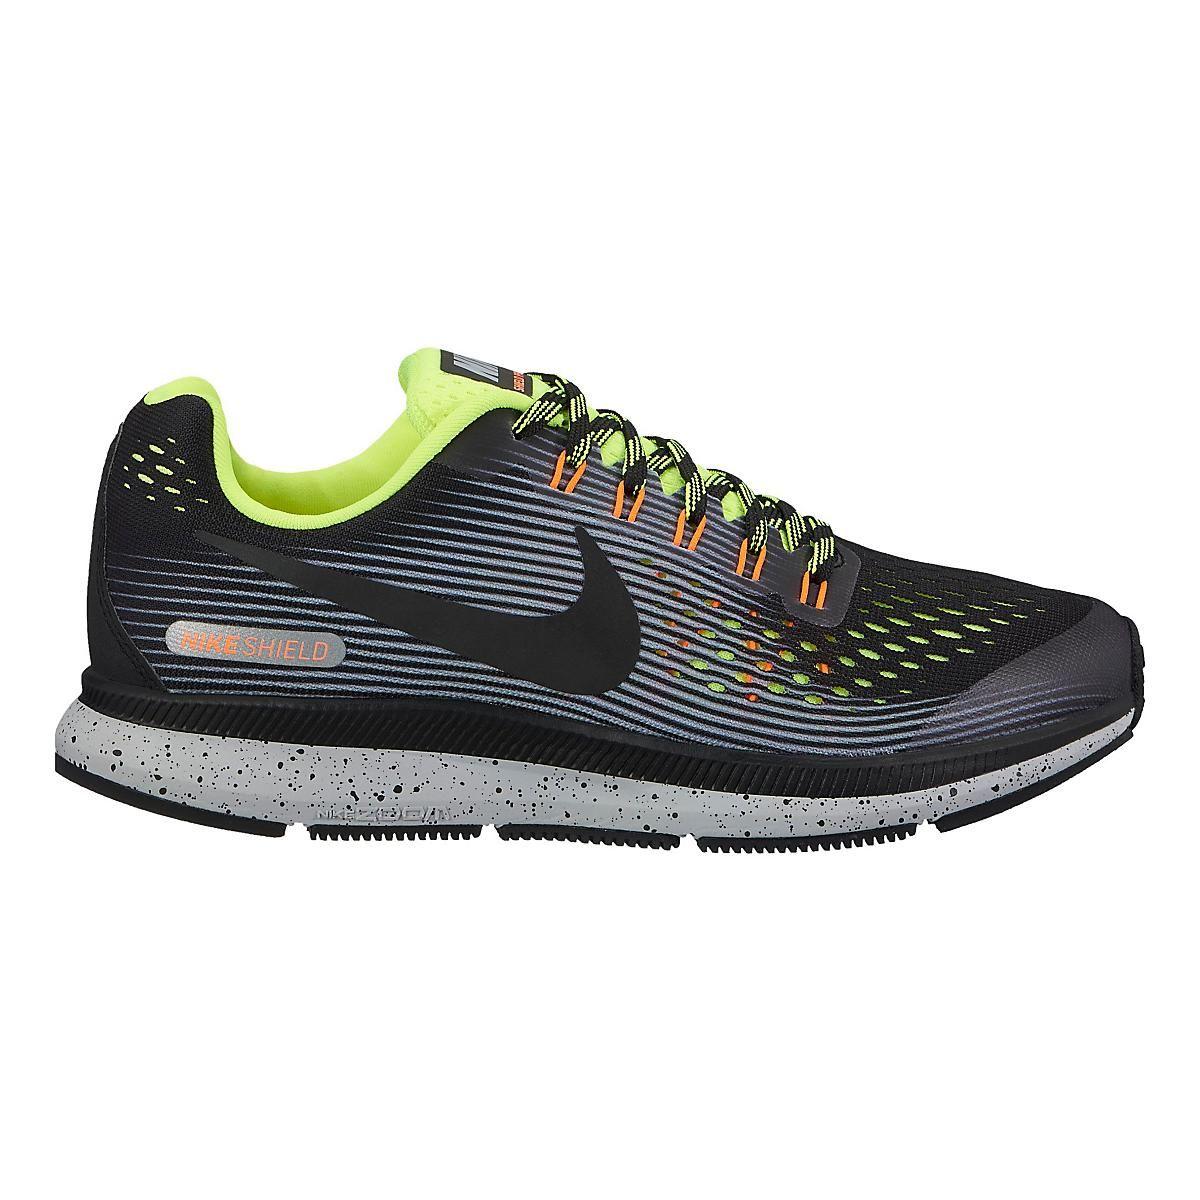 df2fe32a295 Kids Nike Air Zoom Pegasus 34 Shield Running Shoe